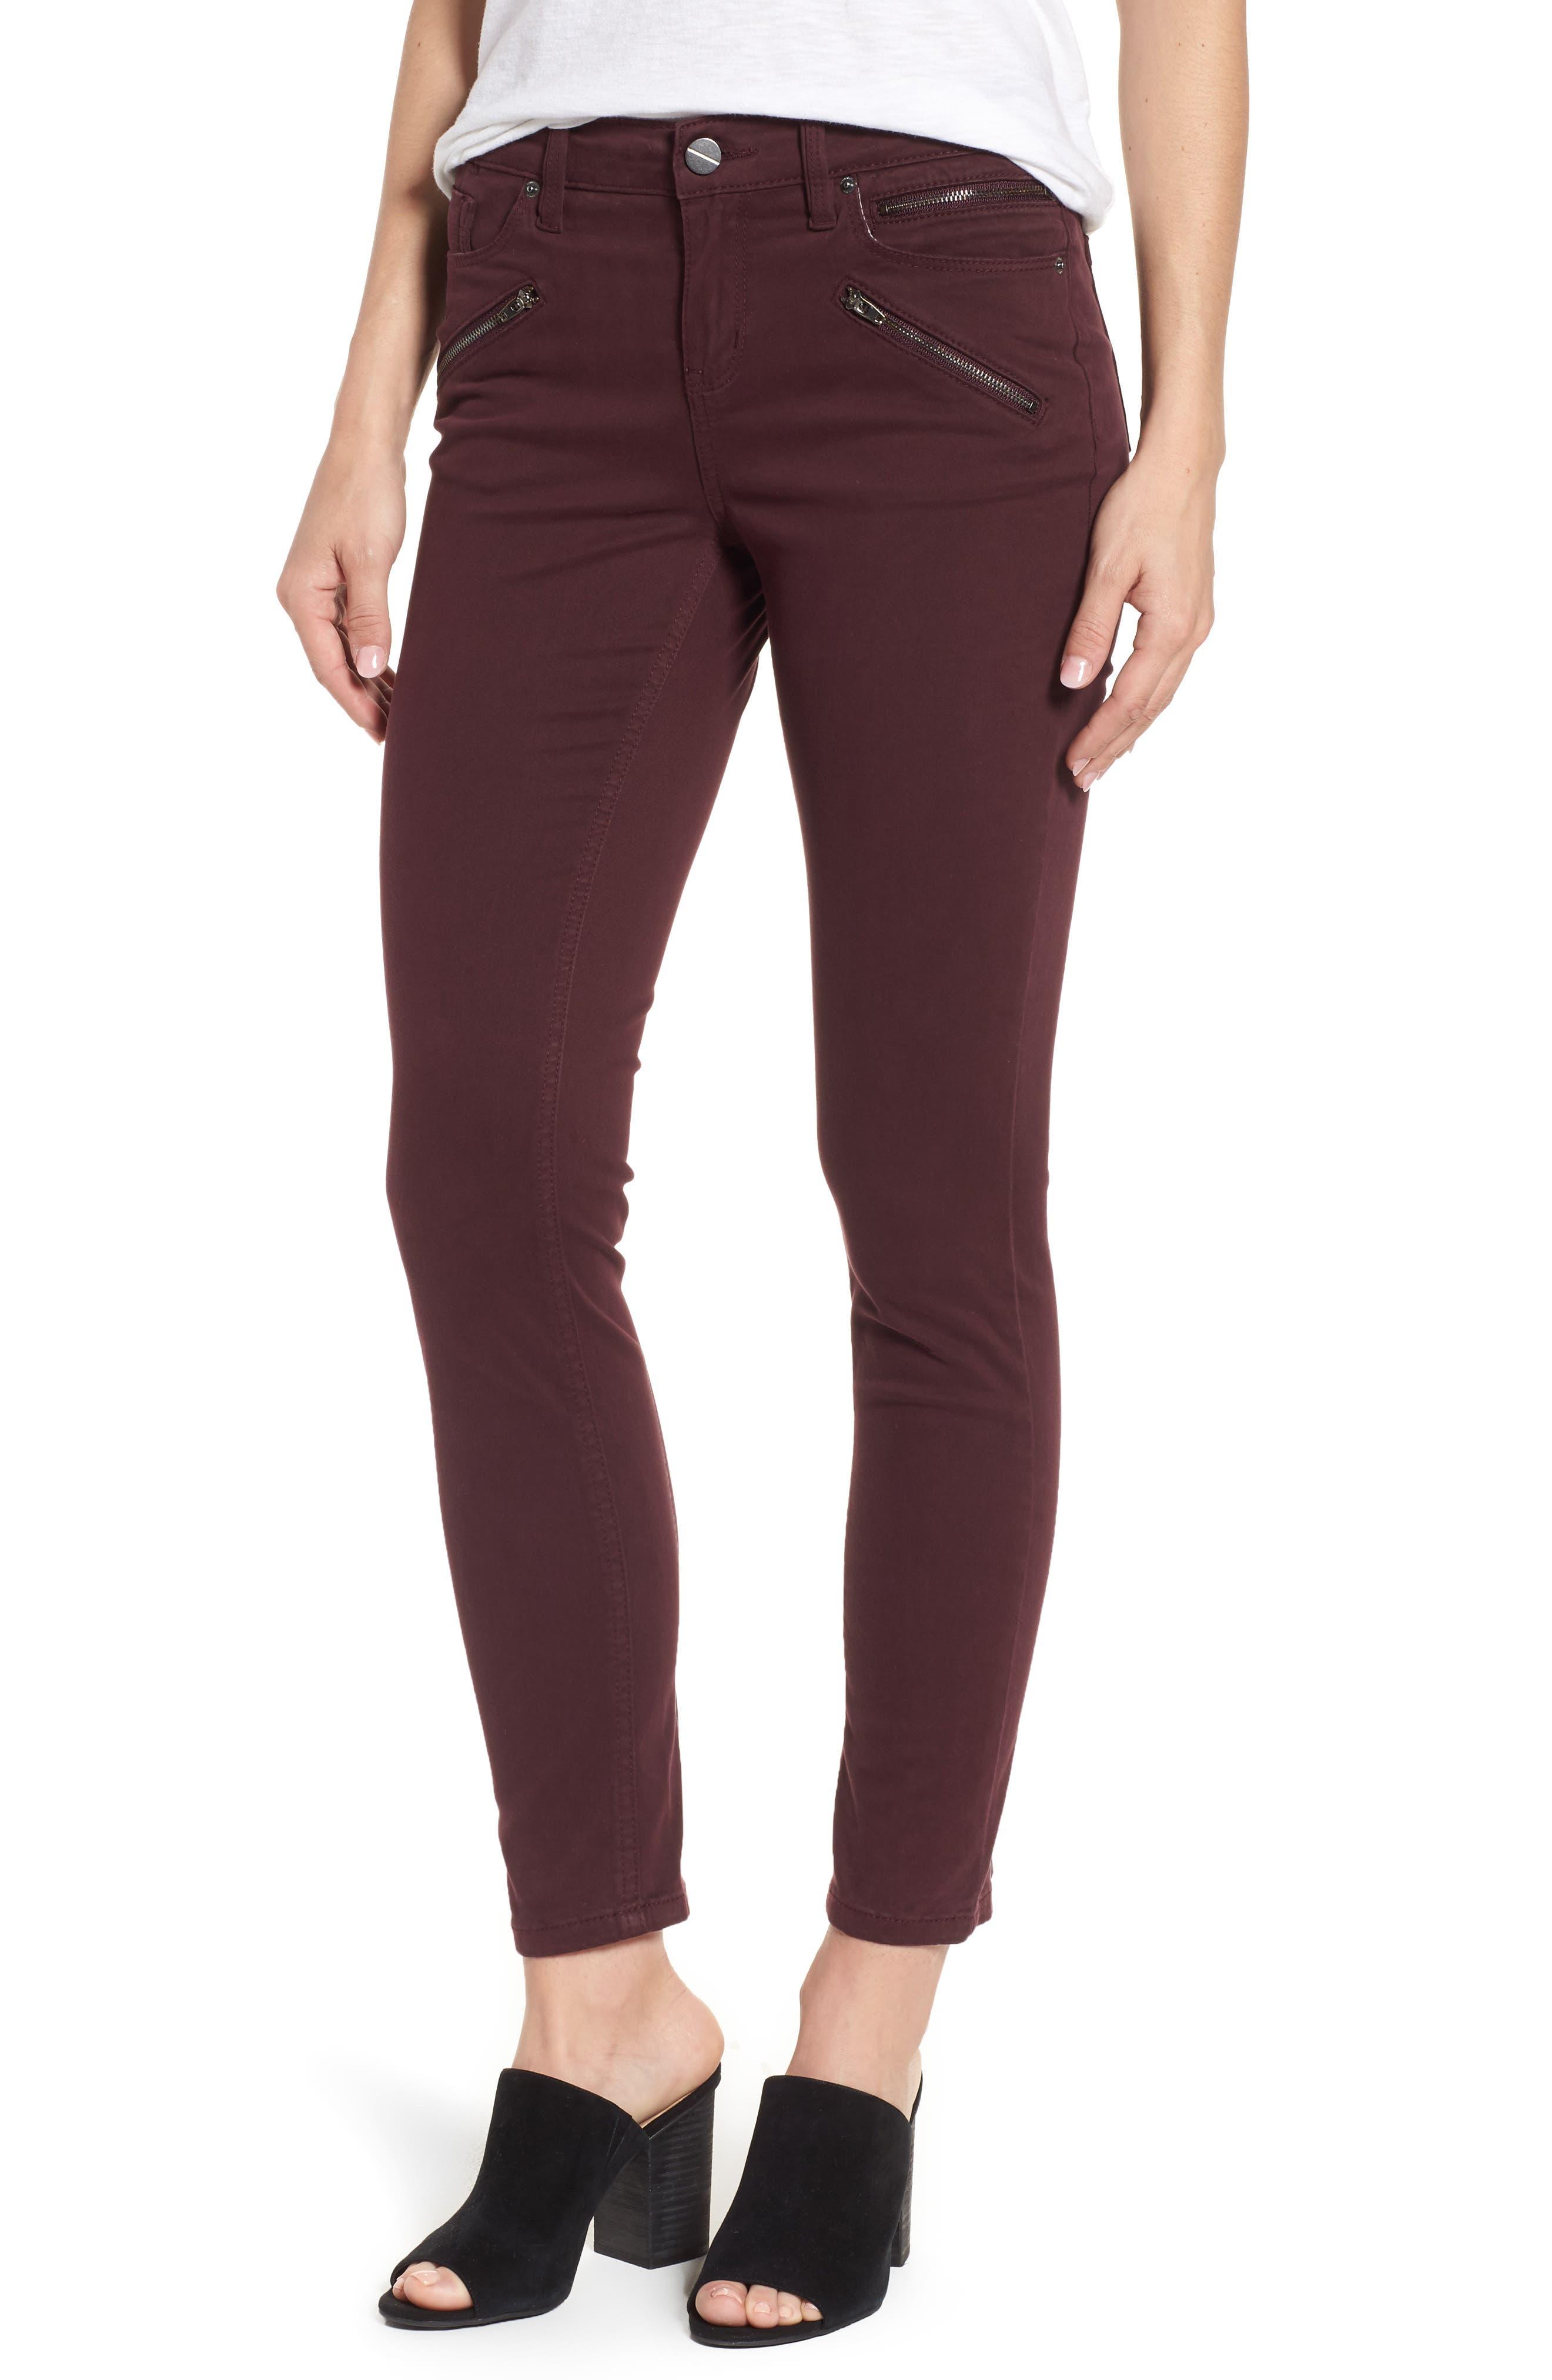 Moto Skinny Jeans,                         Main,                         color, 932